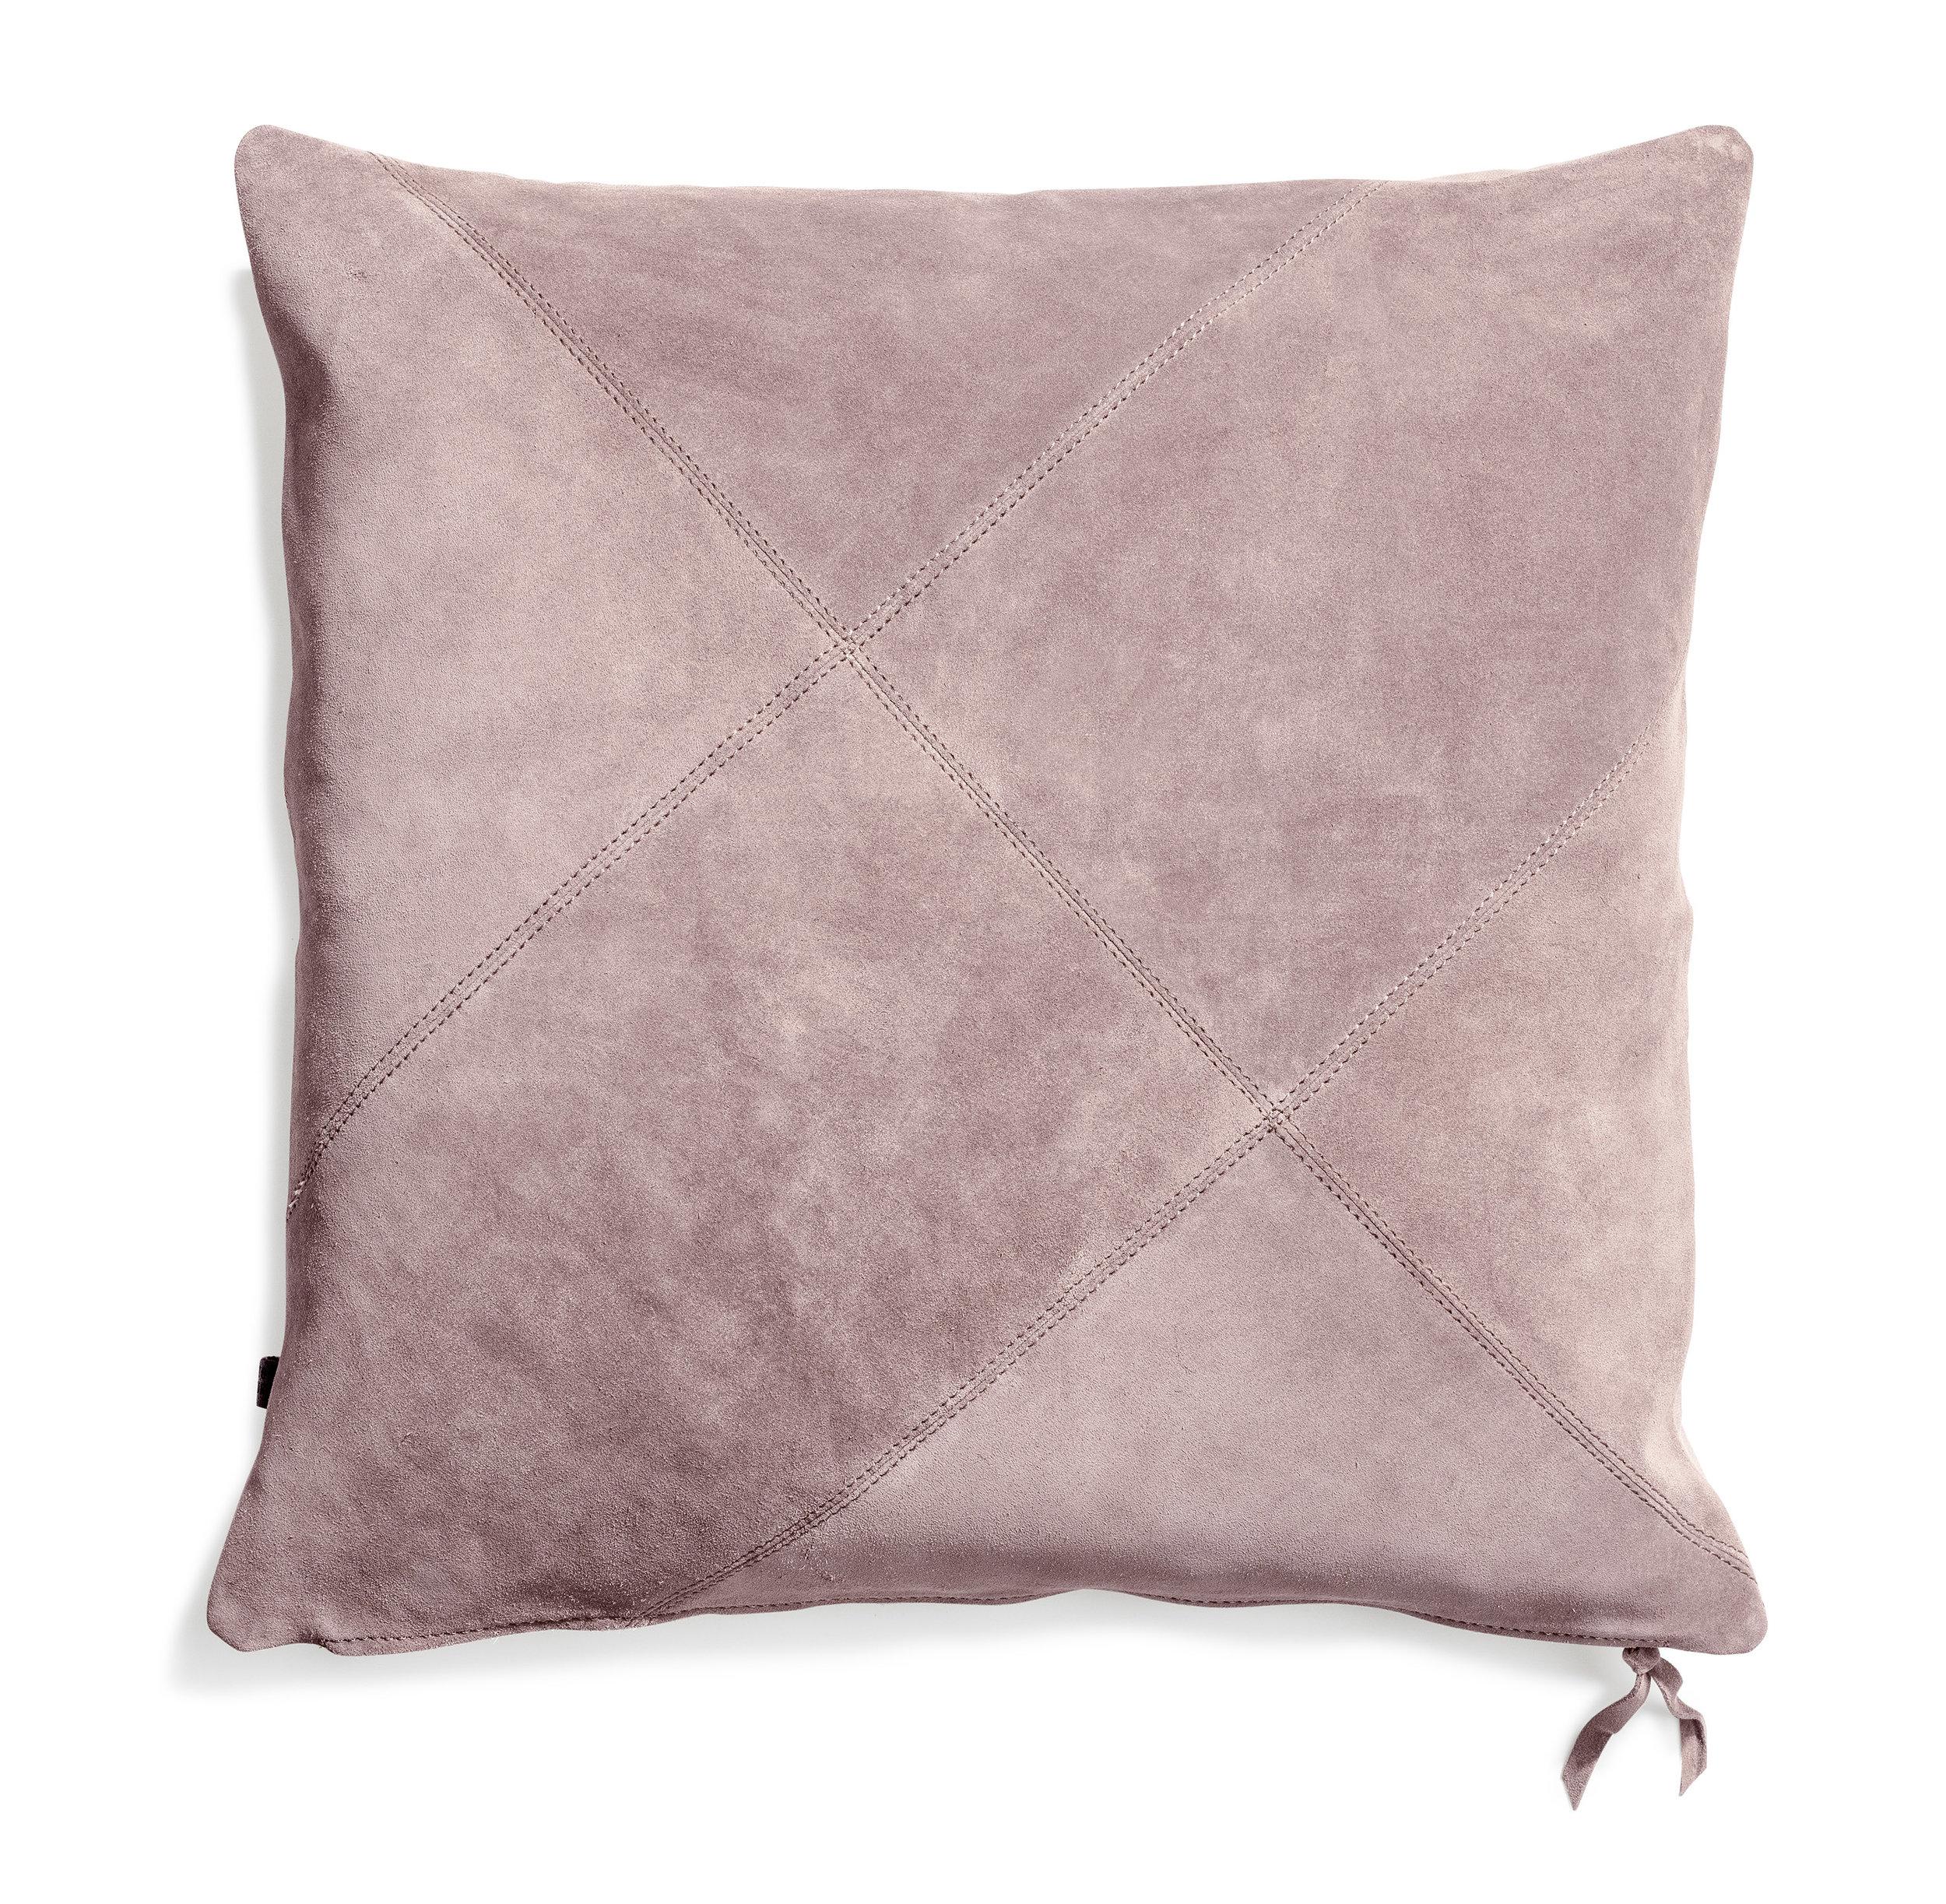 Rafety cushion Pale heather suede 50x50  Wrigley cushion Pale heather suede 60x60